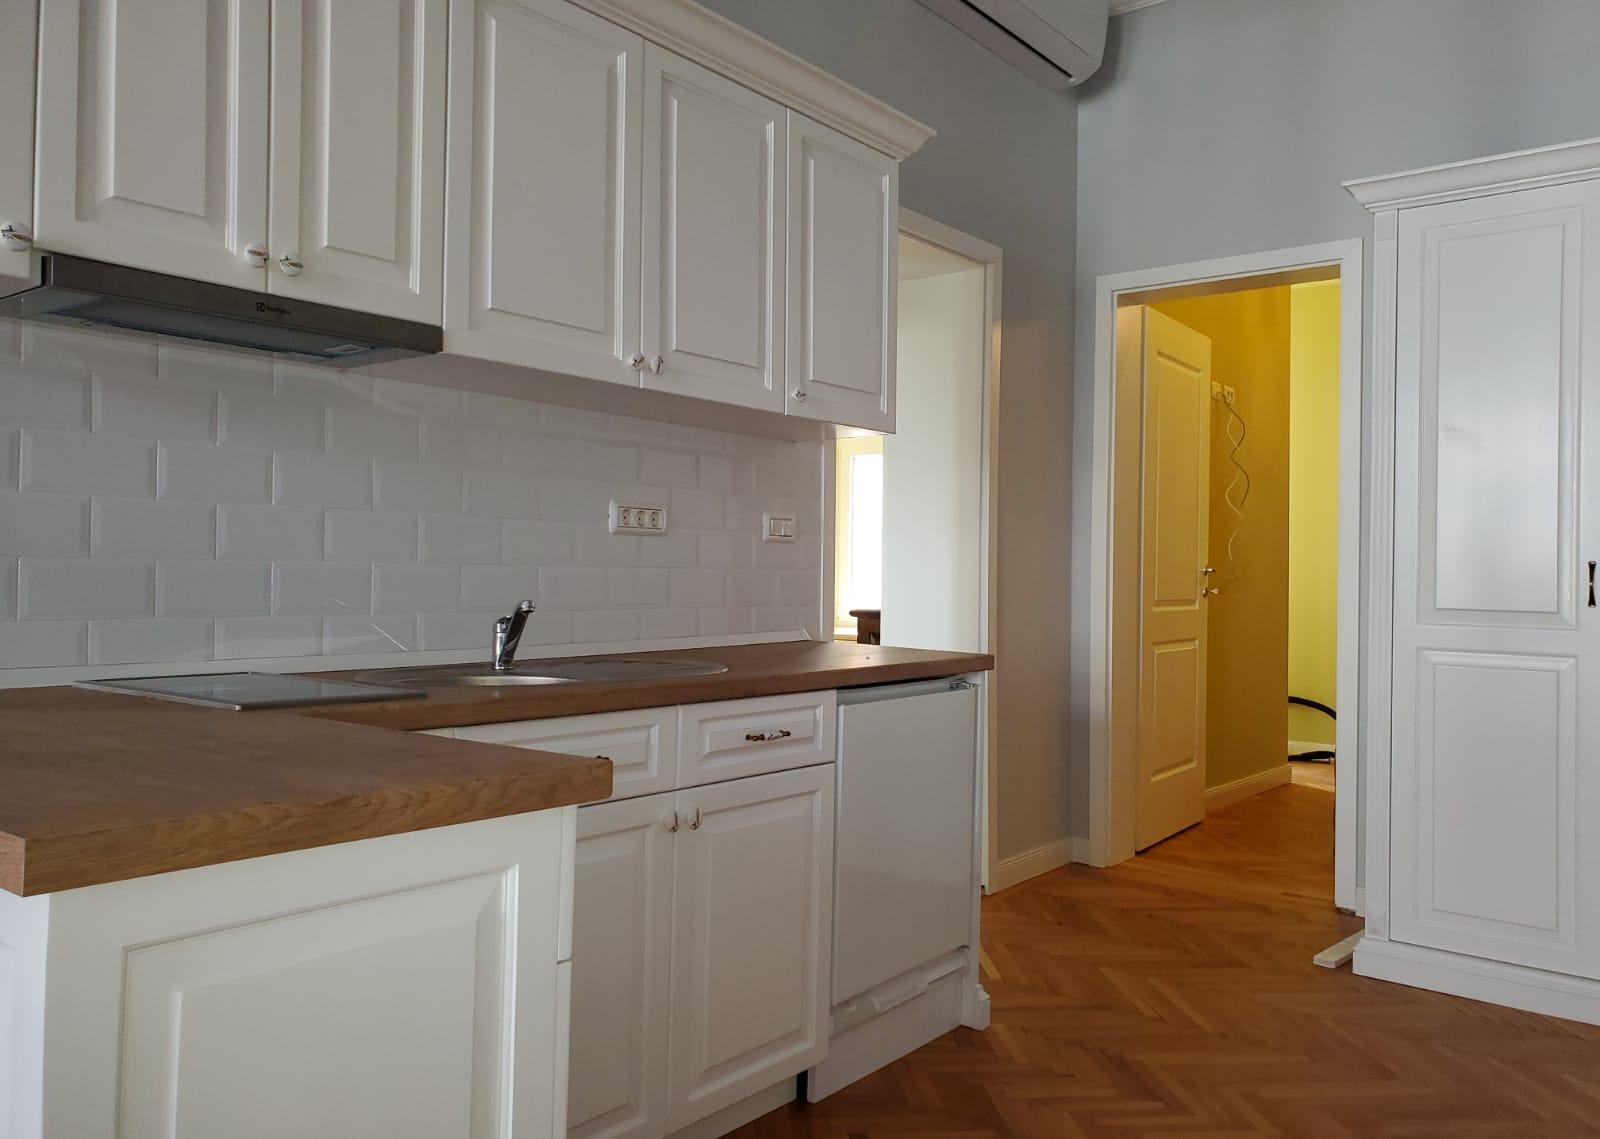 Inchiriez apartament 2 camere in regim hotelier zona Ultracentrala